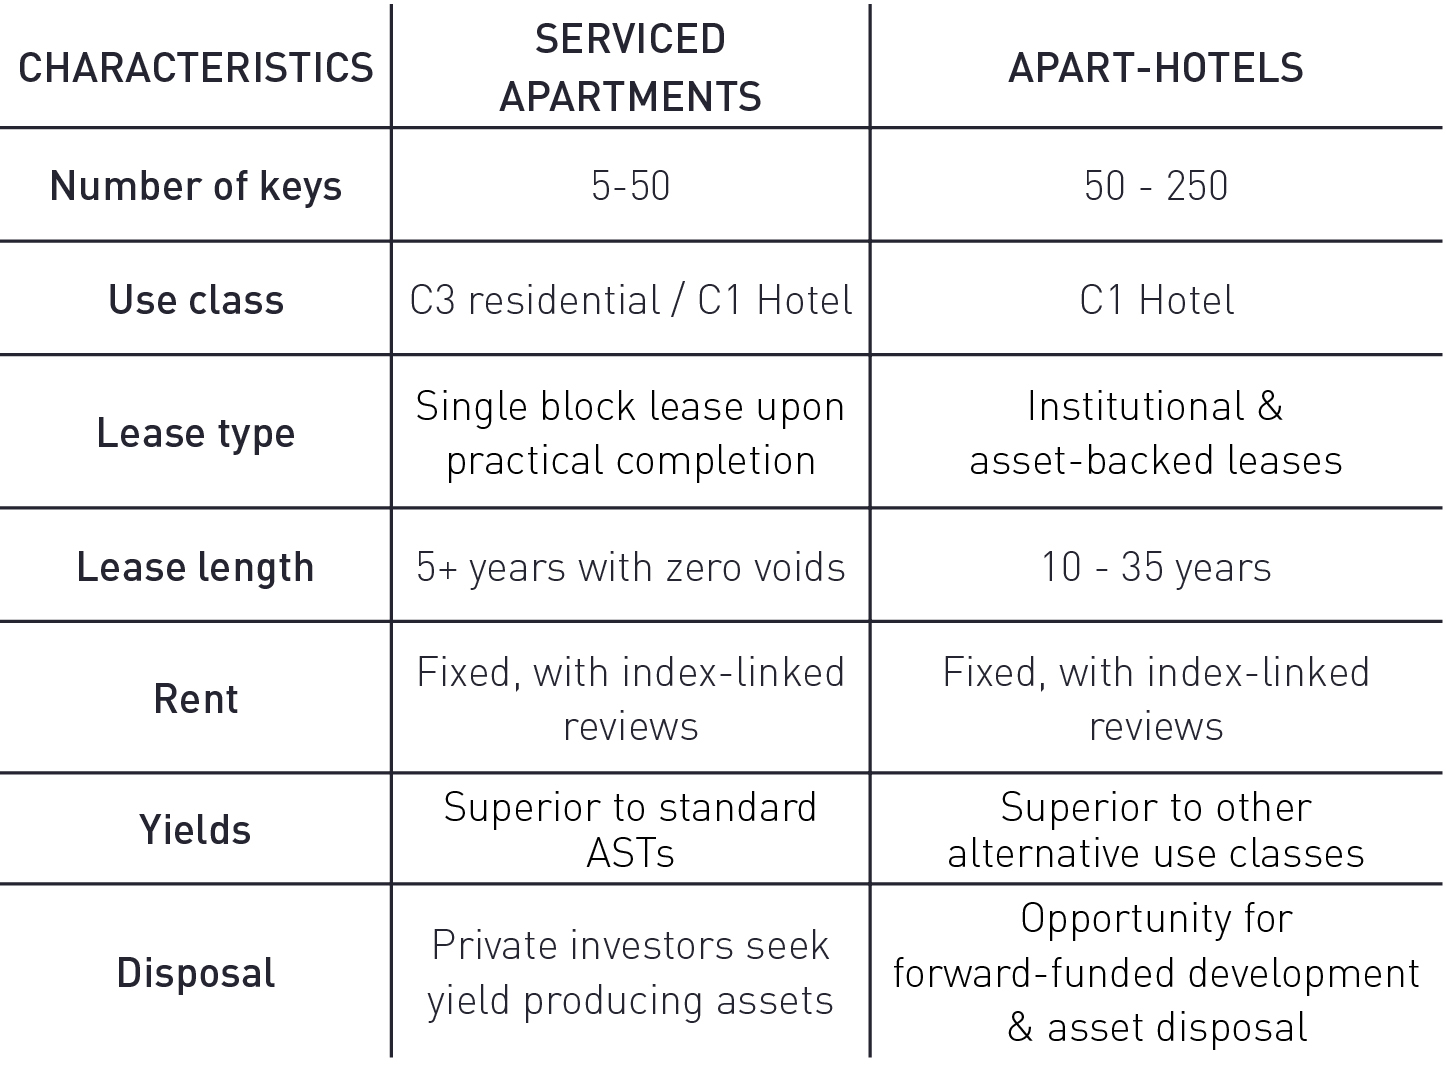 serviced apartment characteristics.jpg